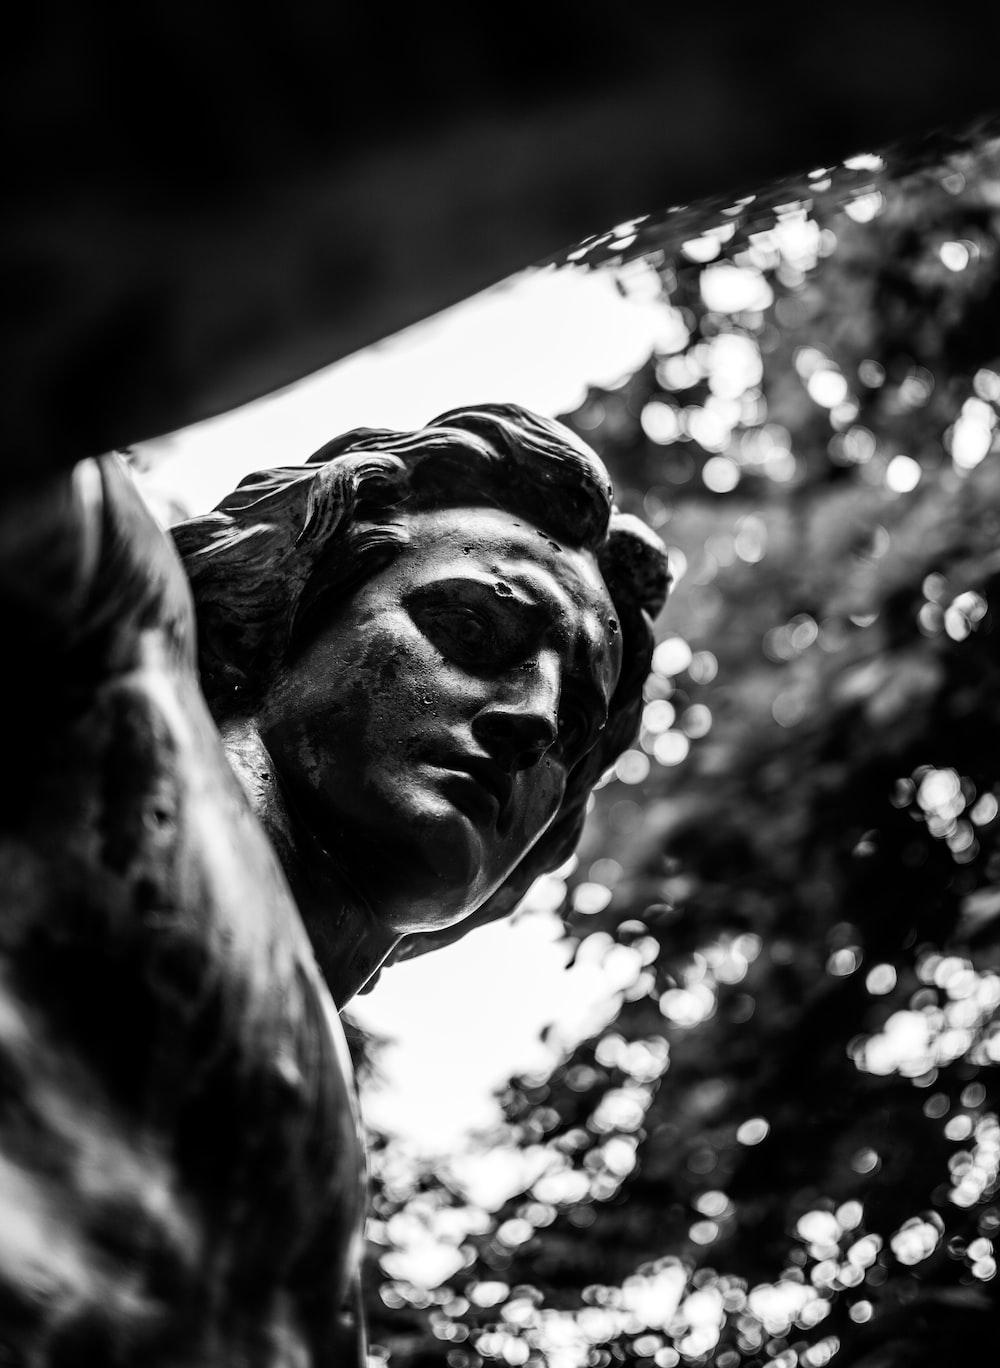 man's statue